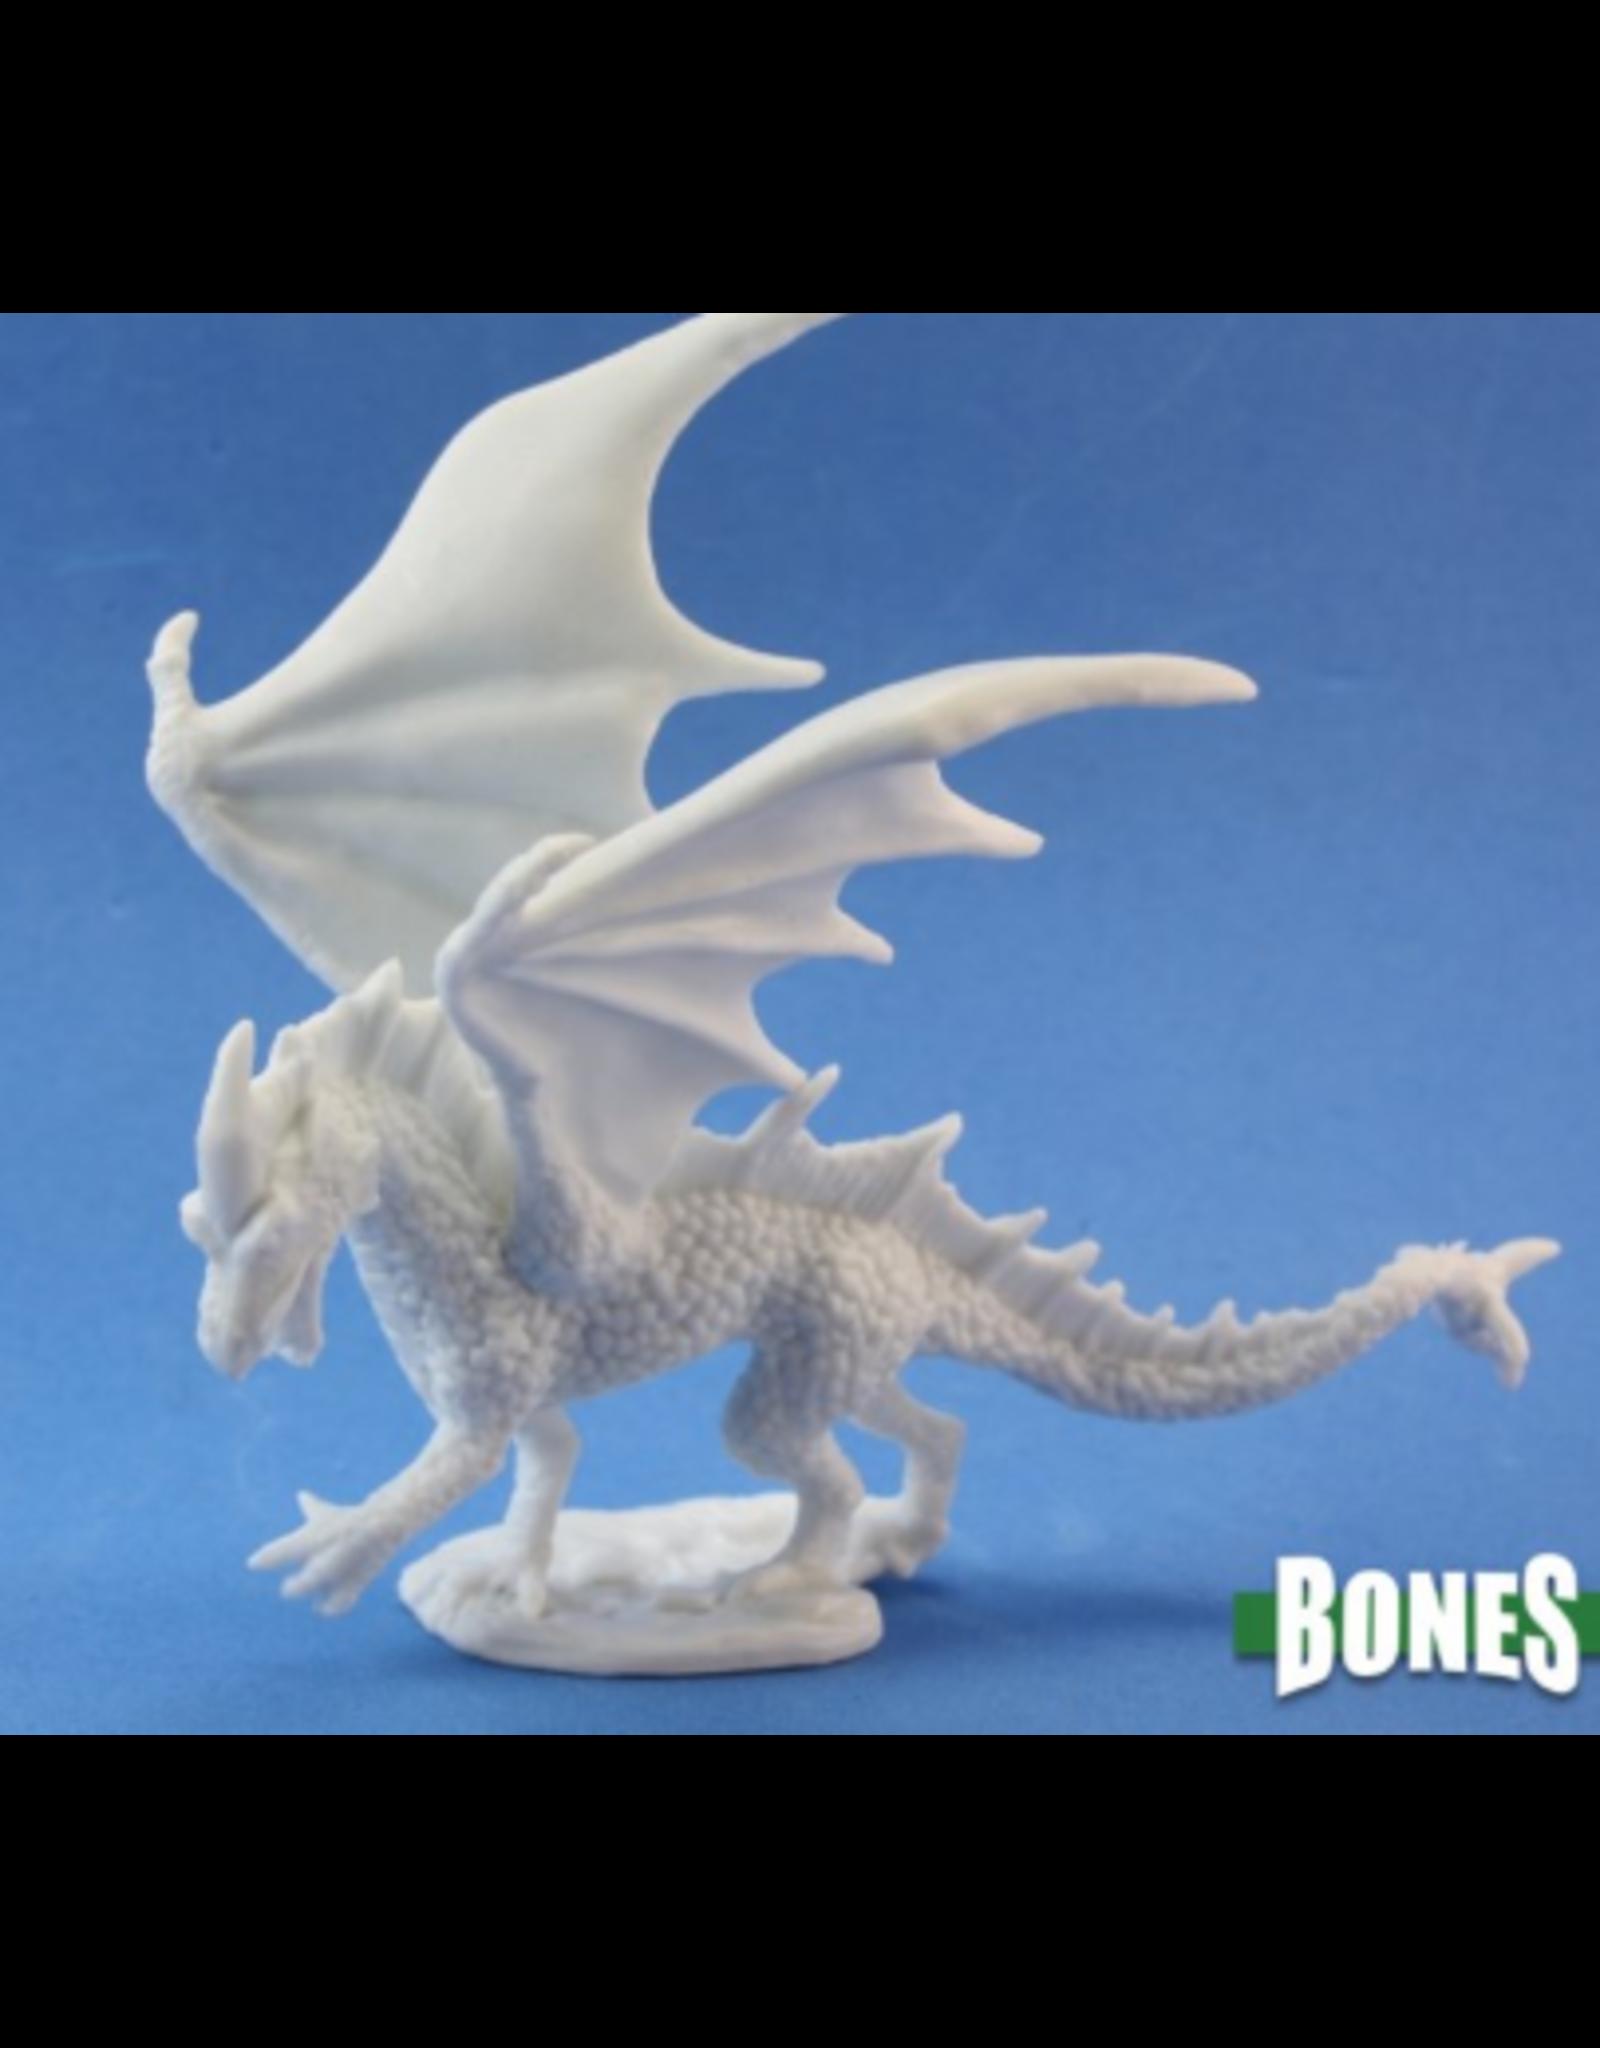 Reaper Dark Heaven Bones: Young Fire Dragon